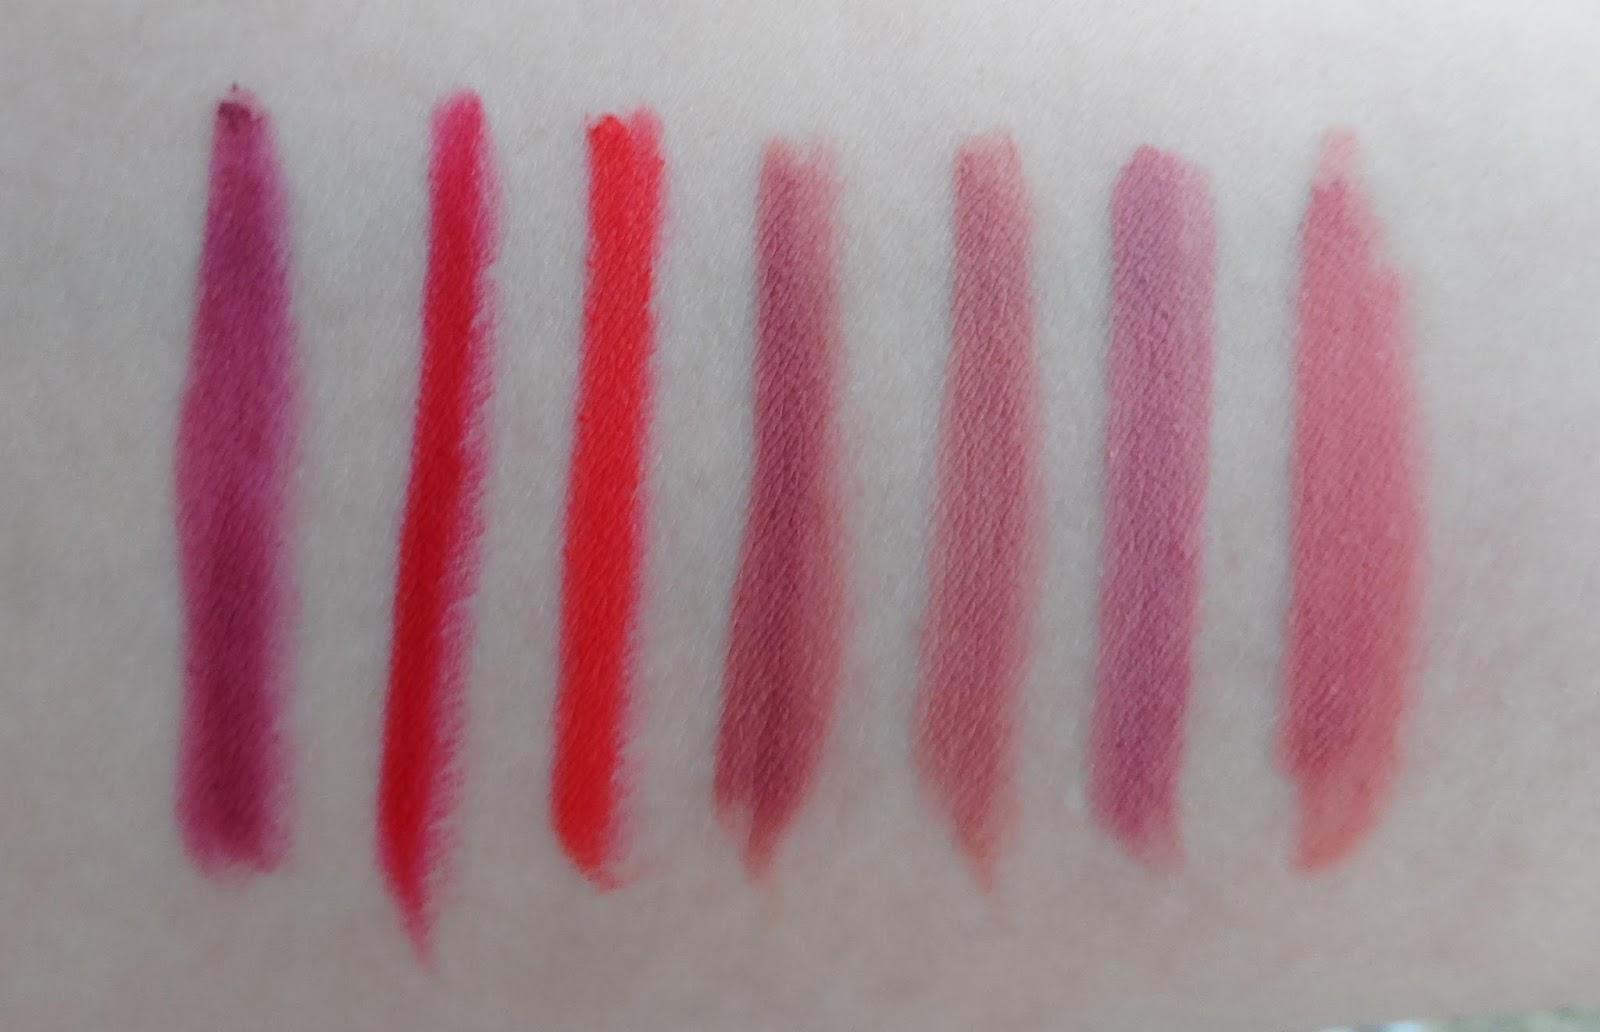 Lip Cheat Lip Liner by Charlotte Tilbury #15